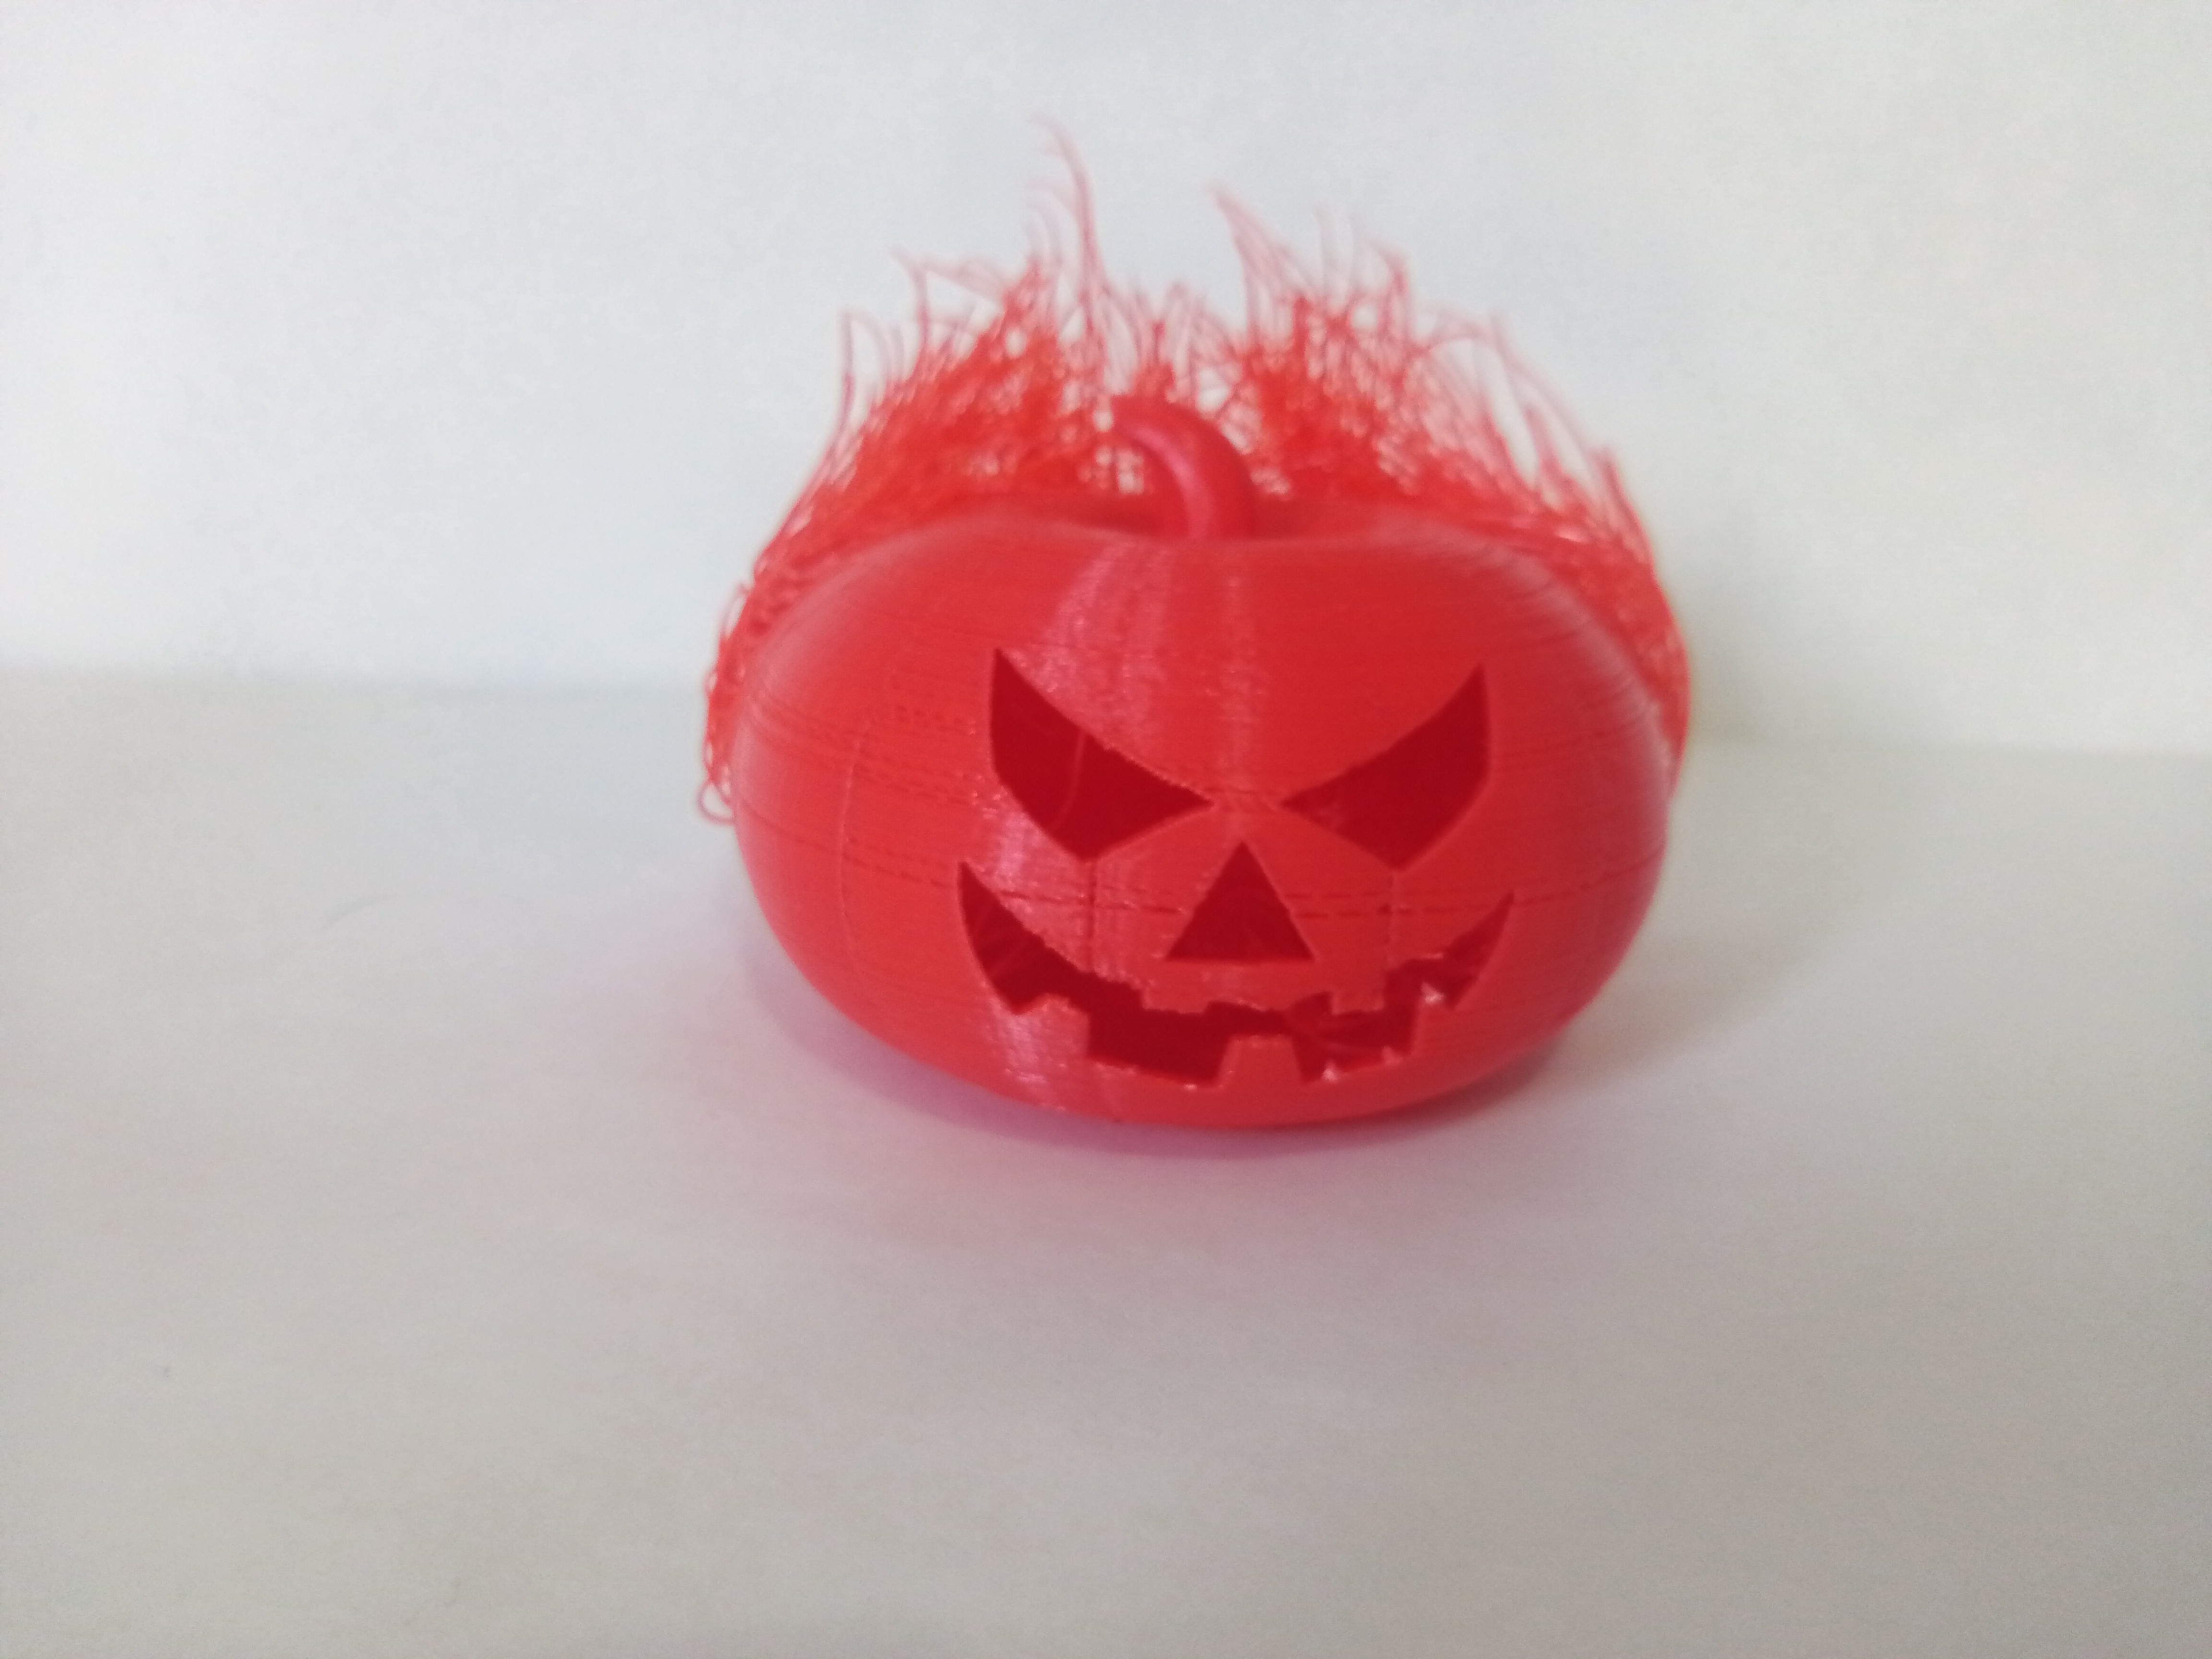 P_20181030_122105.jpg Download free STL file Hairy Pumpkin • 3D printer model, sketchprint3d